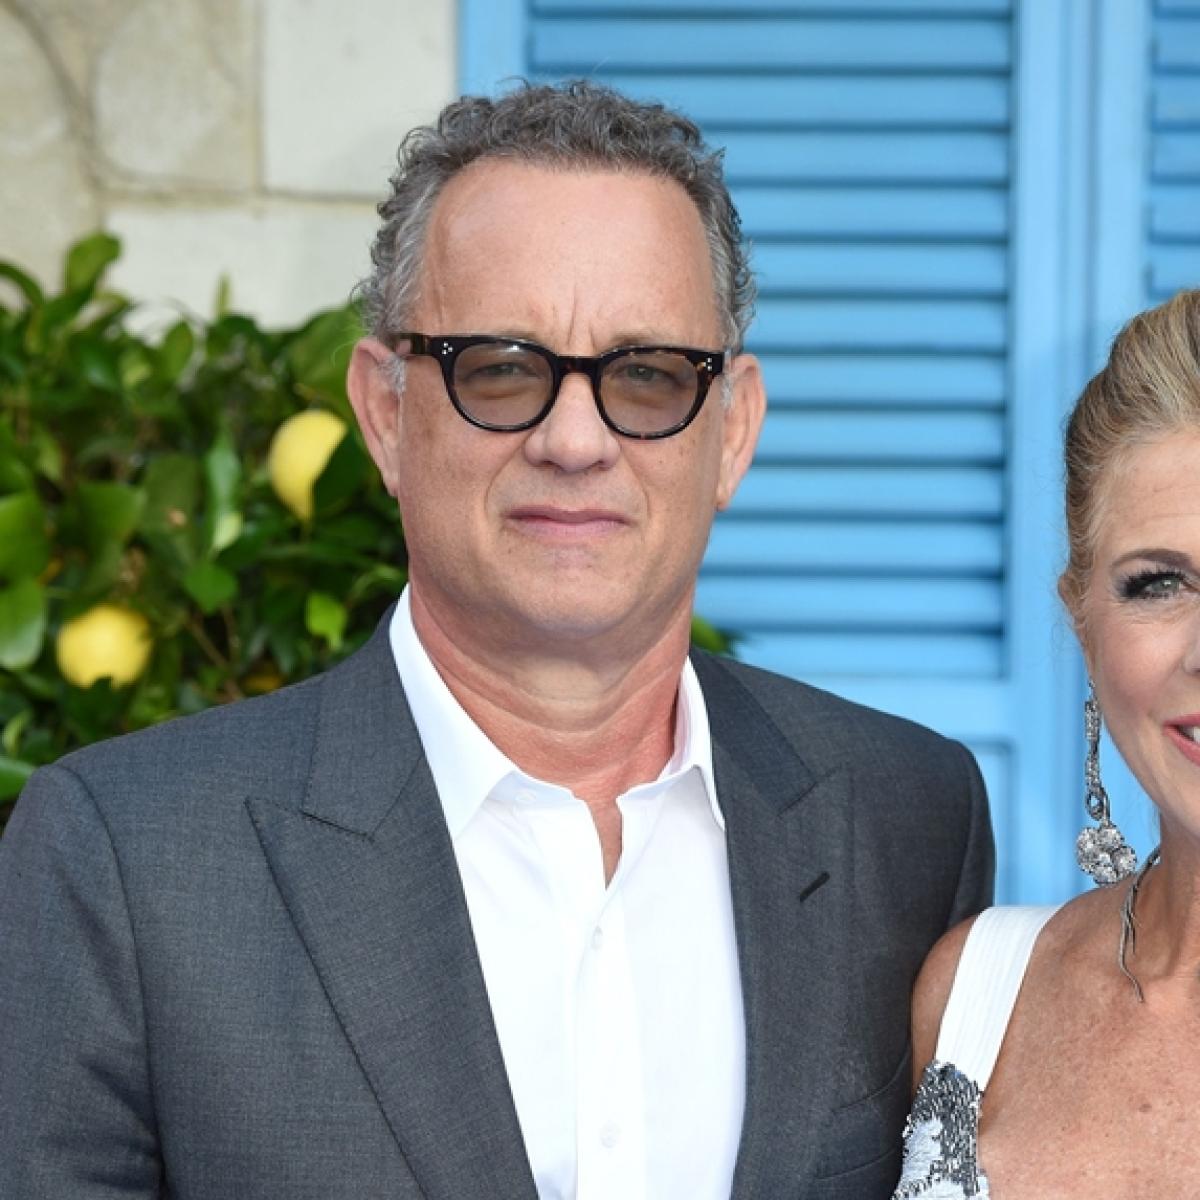 Tom Hanks and his wife Rita Wilson test positive for coronavirus in Australia